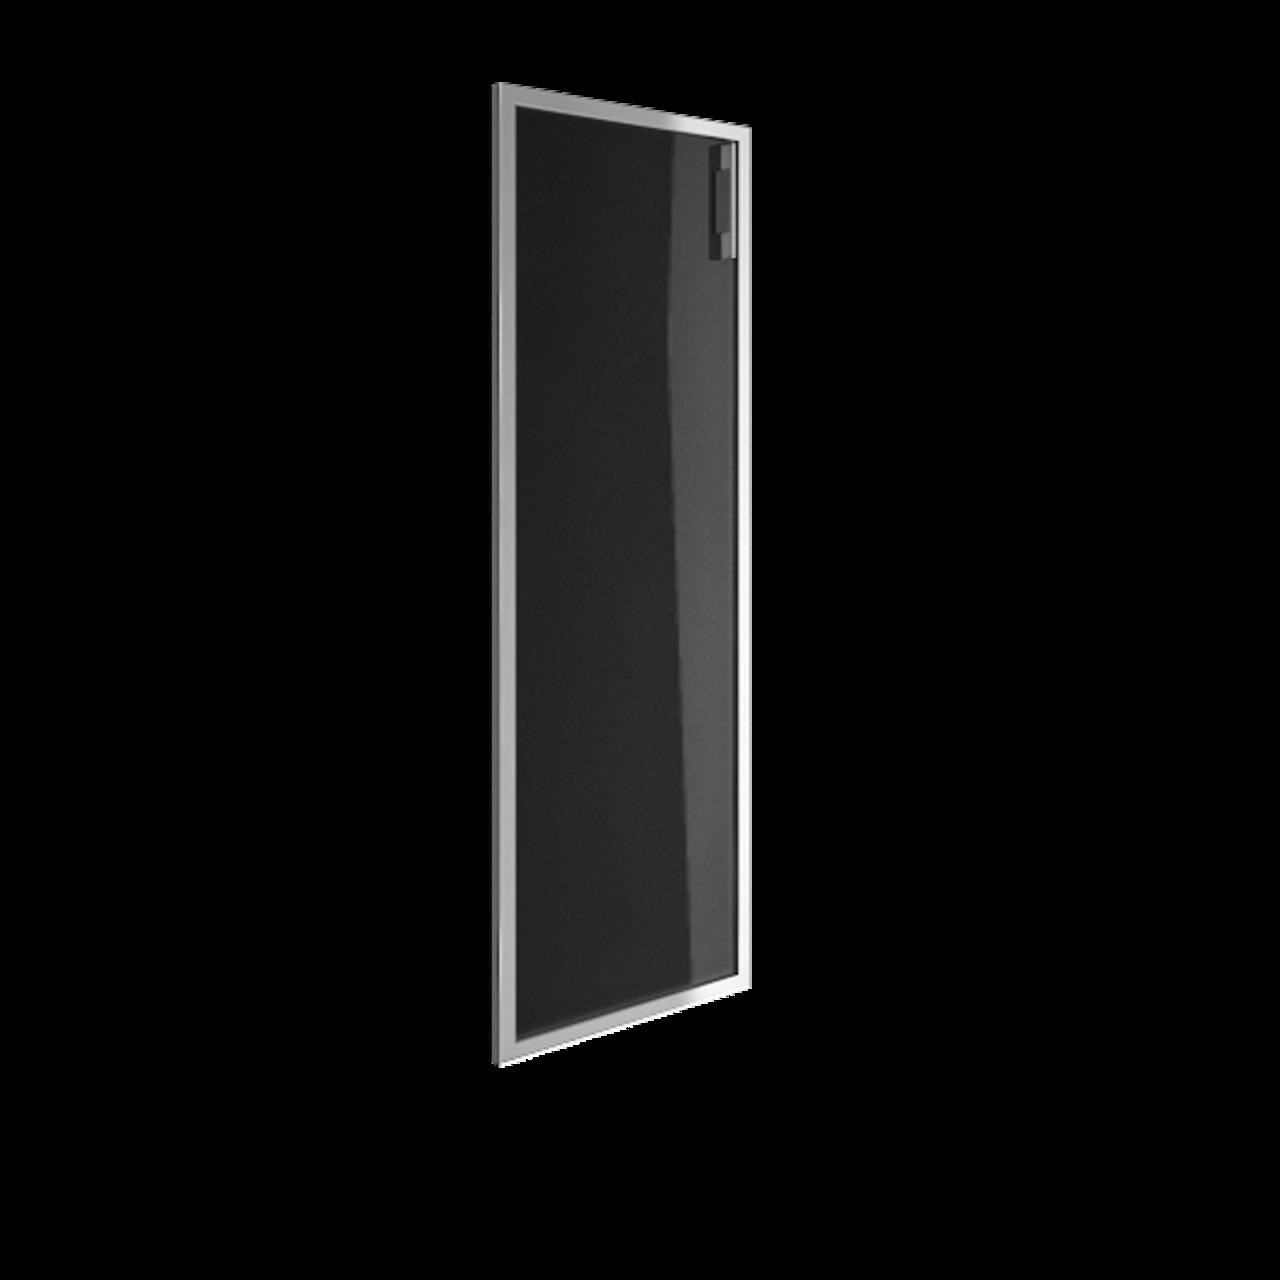 Дверь стекло в раме среднее Lacobel black левая - фото 3